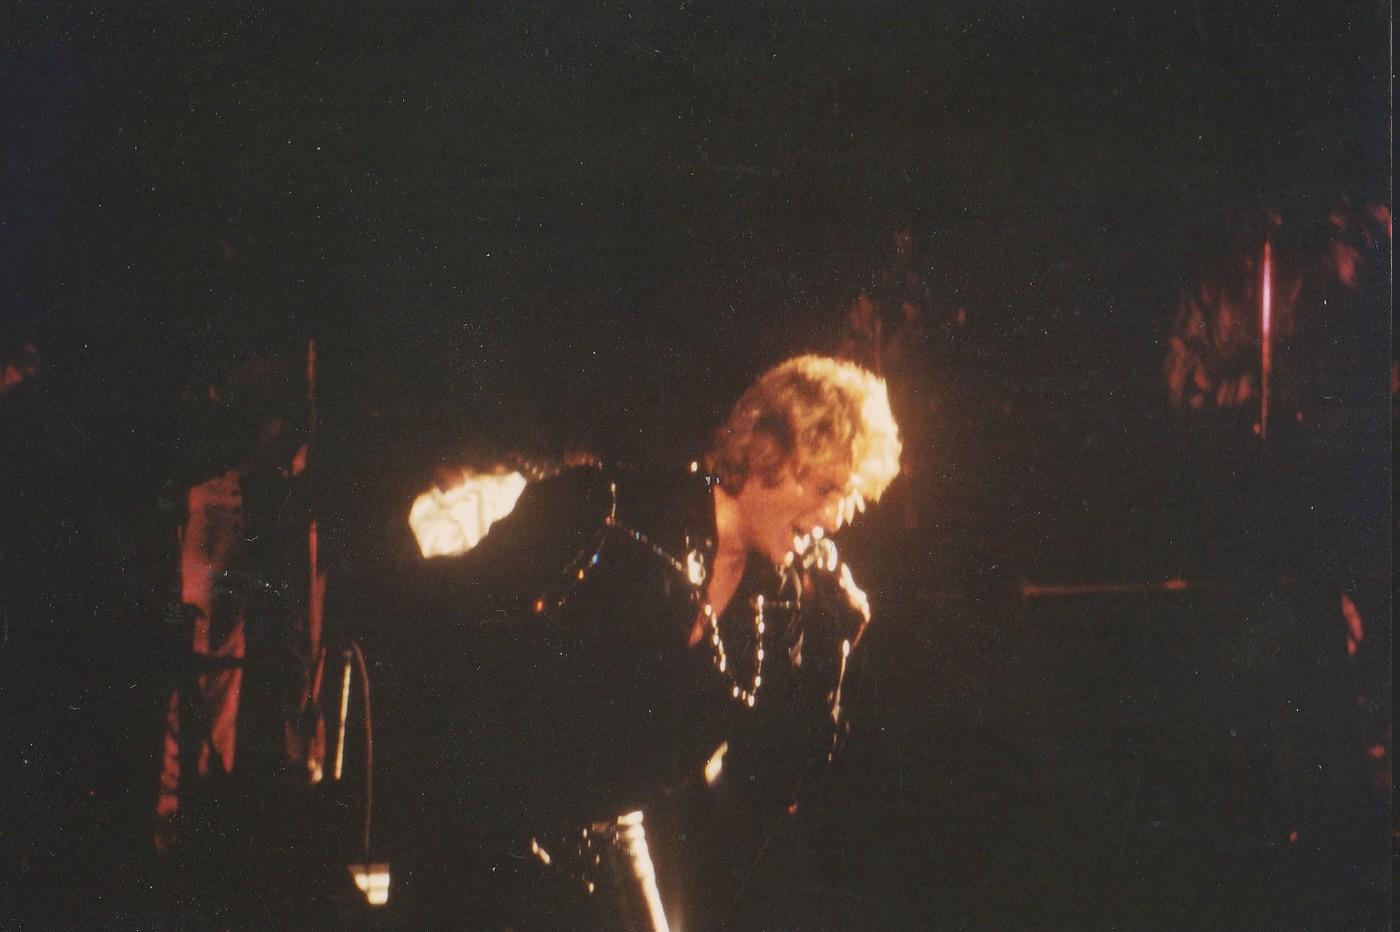 INÉDIT  :  JOHNNY HALLYDAY EN TOURNEE - HIVER 1978 -1979 ( PHOTOS INÉDITES )   Img_2637